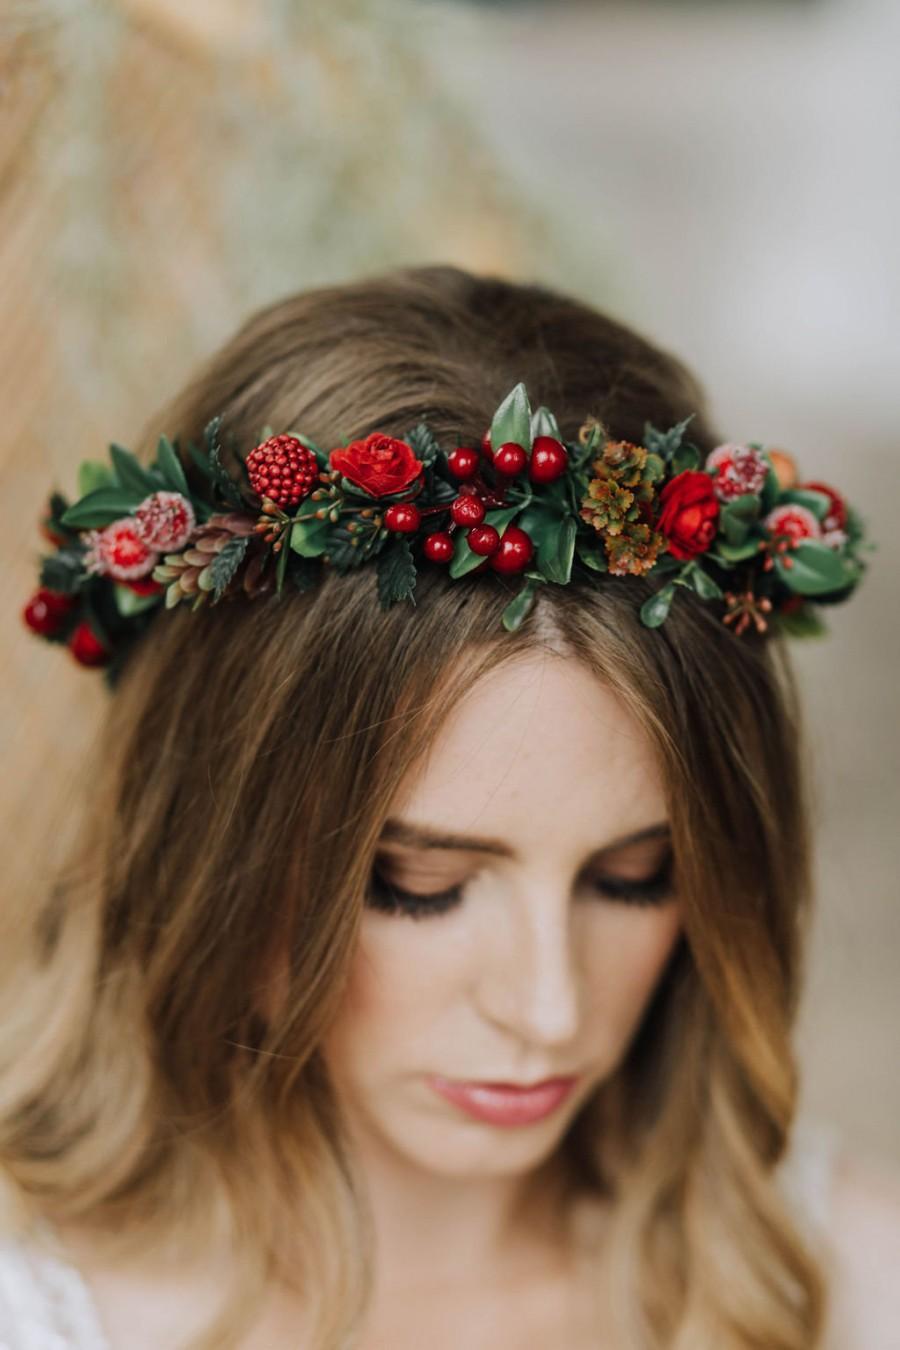 Wedding - Woodland crown, berry crown, floral crown, green crown, boho headpiece, leaf hairband, forest wedding, red flower crown, burgundy hairpiece